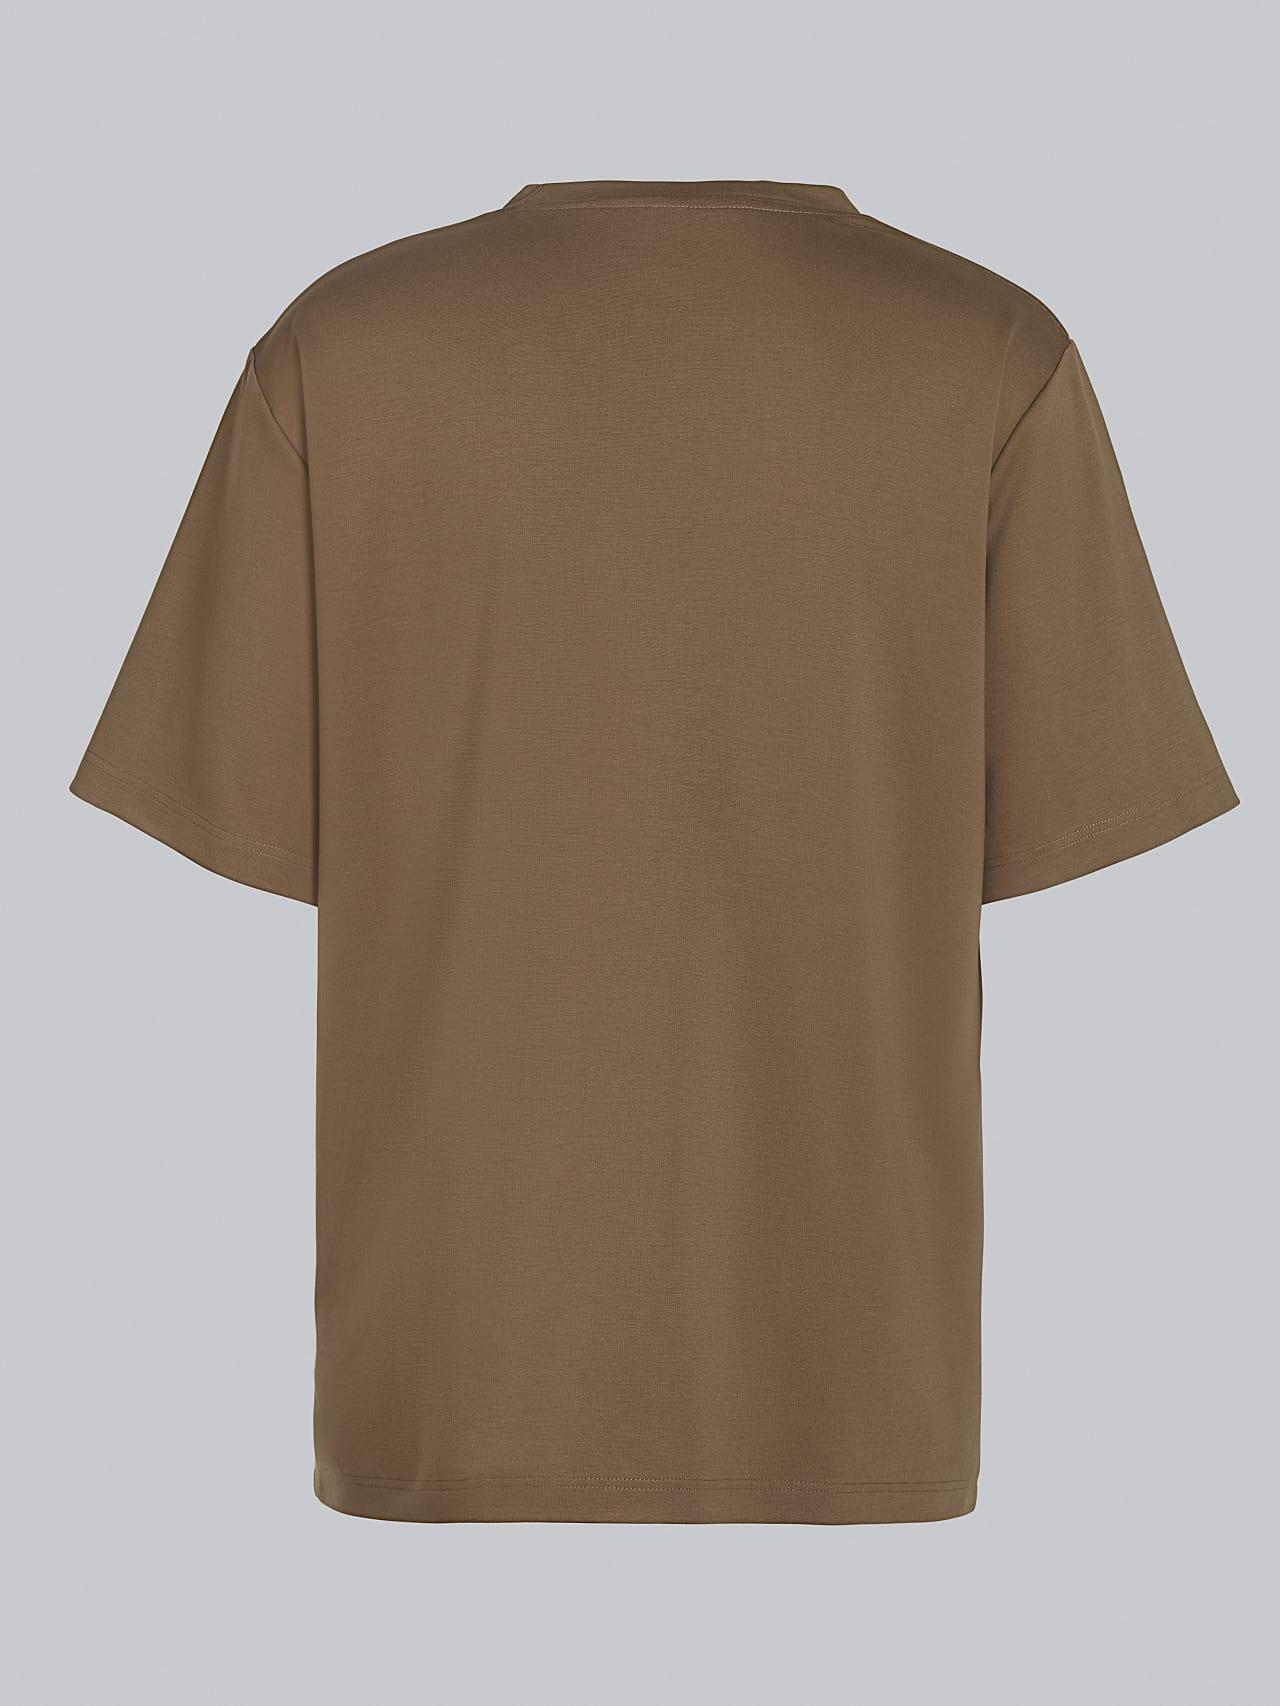 JAHEV V1.Y5.02 Relaxed Logo T-Shirt gold Left Alpha Tauri